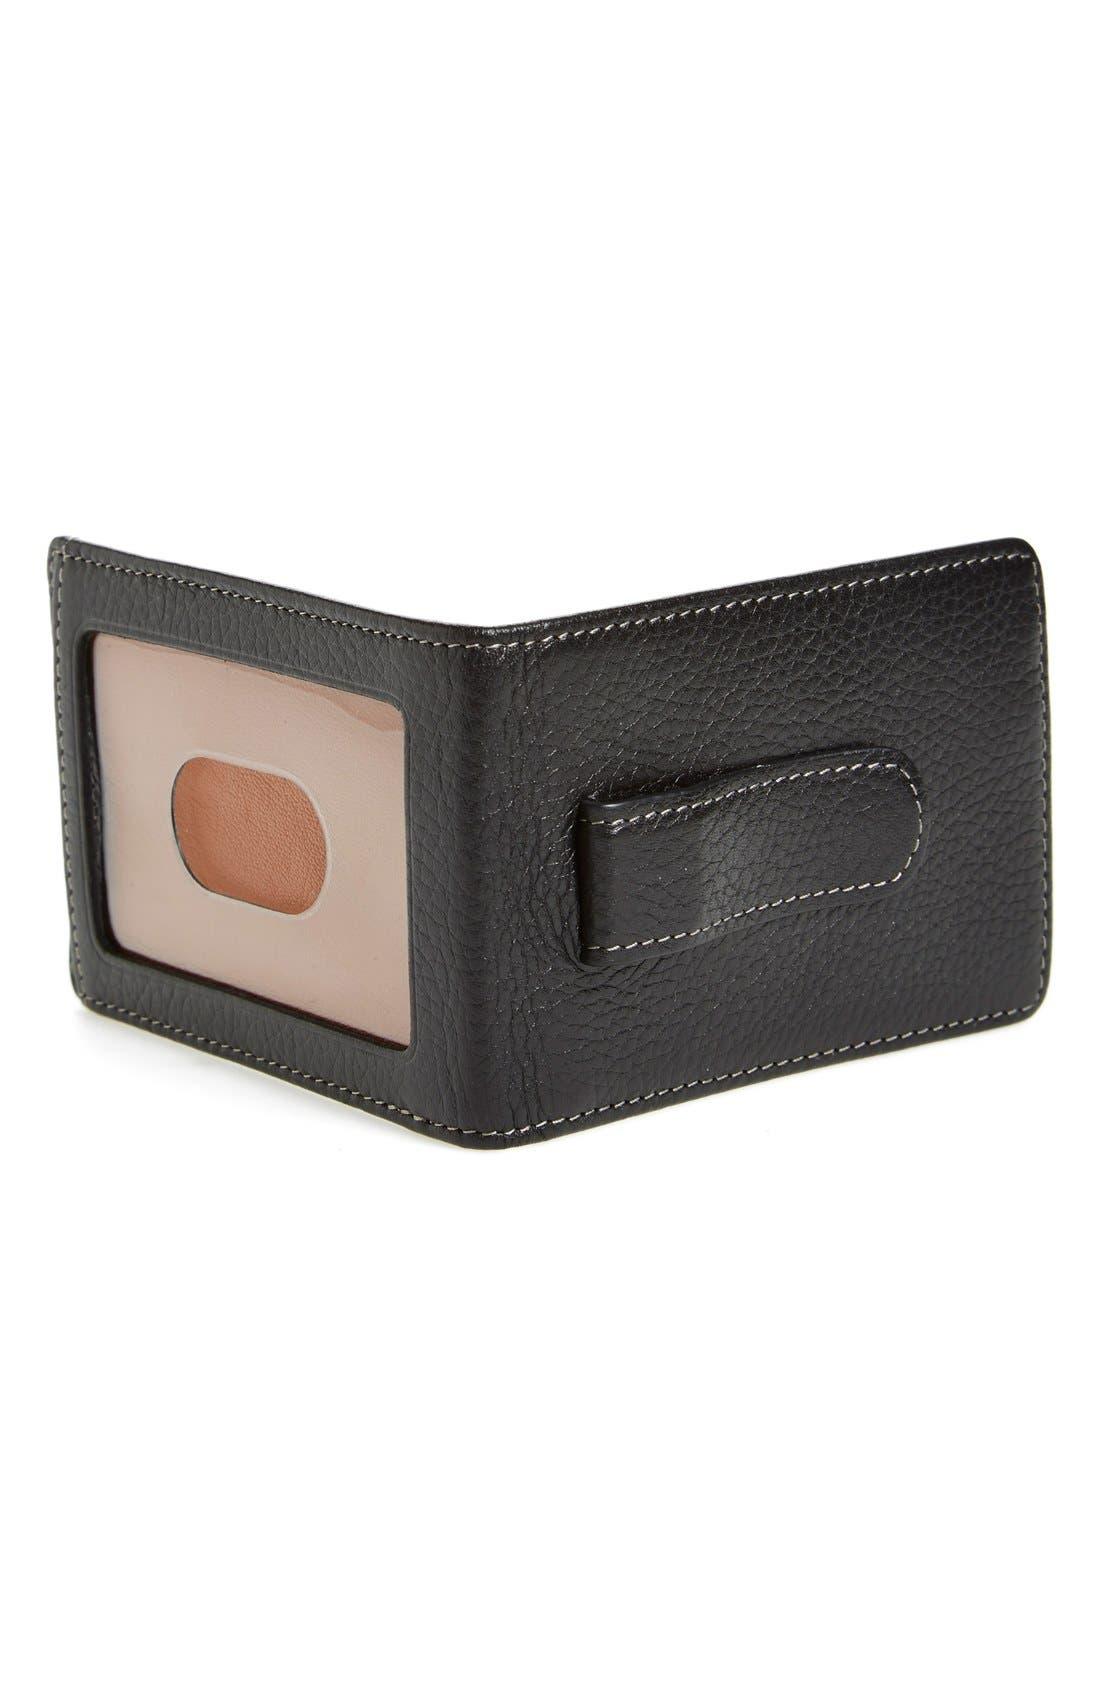 'Tyler' Money Clip Wallet,                             Alternate thumbnail 5, color,                             001